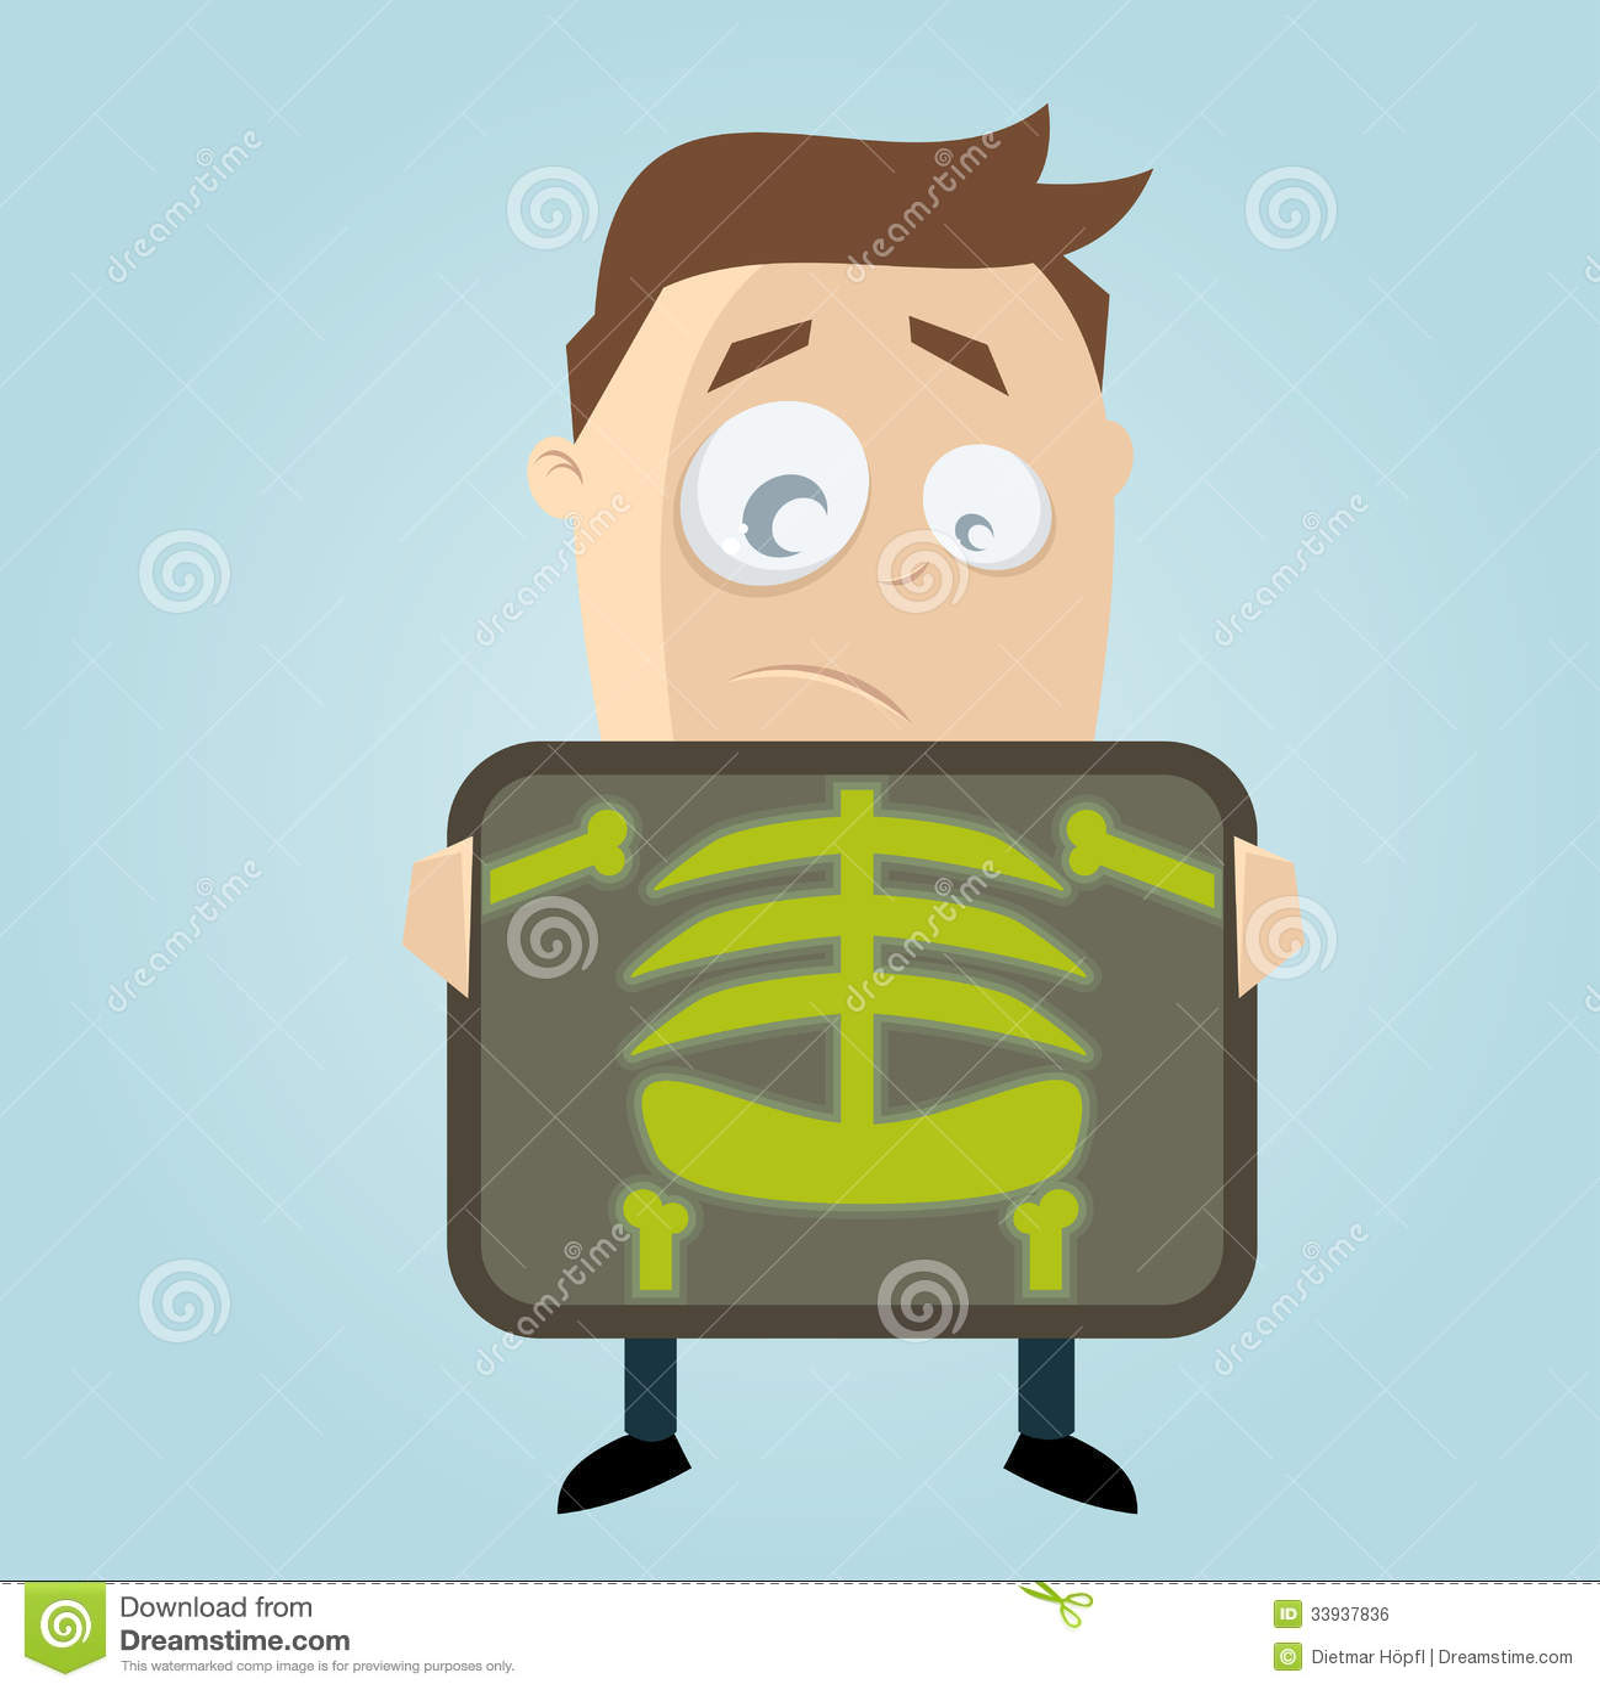 Cartoon Man Is Getting X-ray Examination Royalty Free Stock Image ...